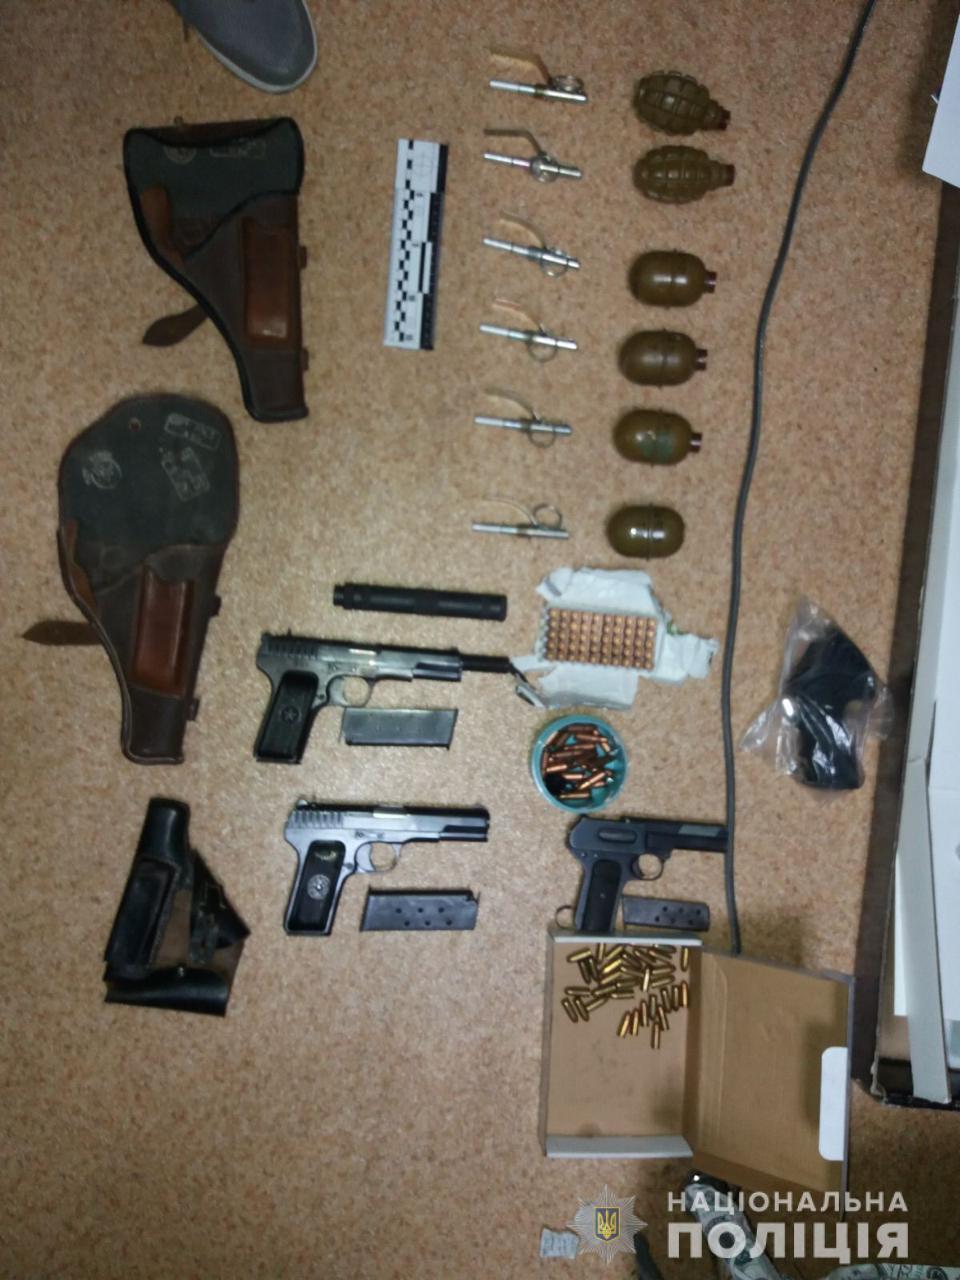 арсенал оружия сообщника луцкого террориста